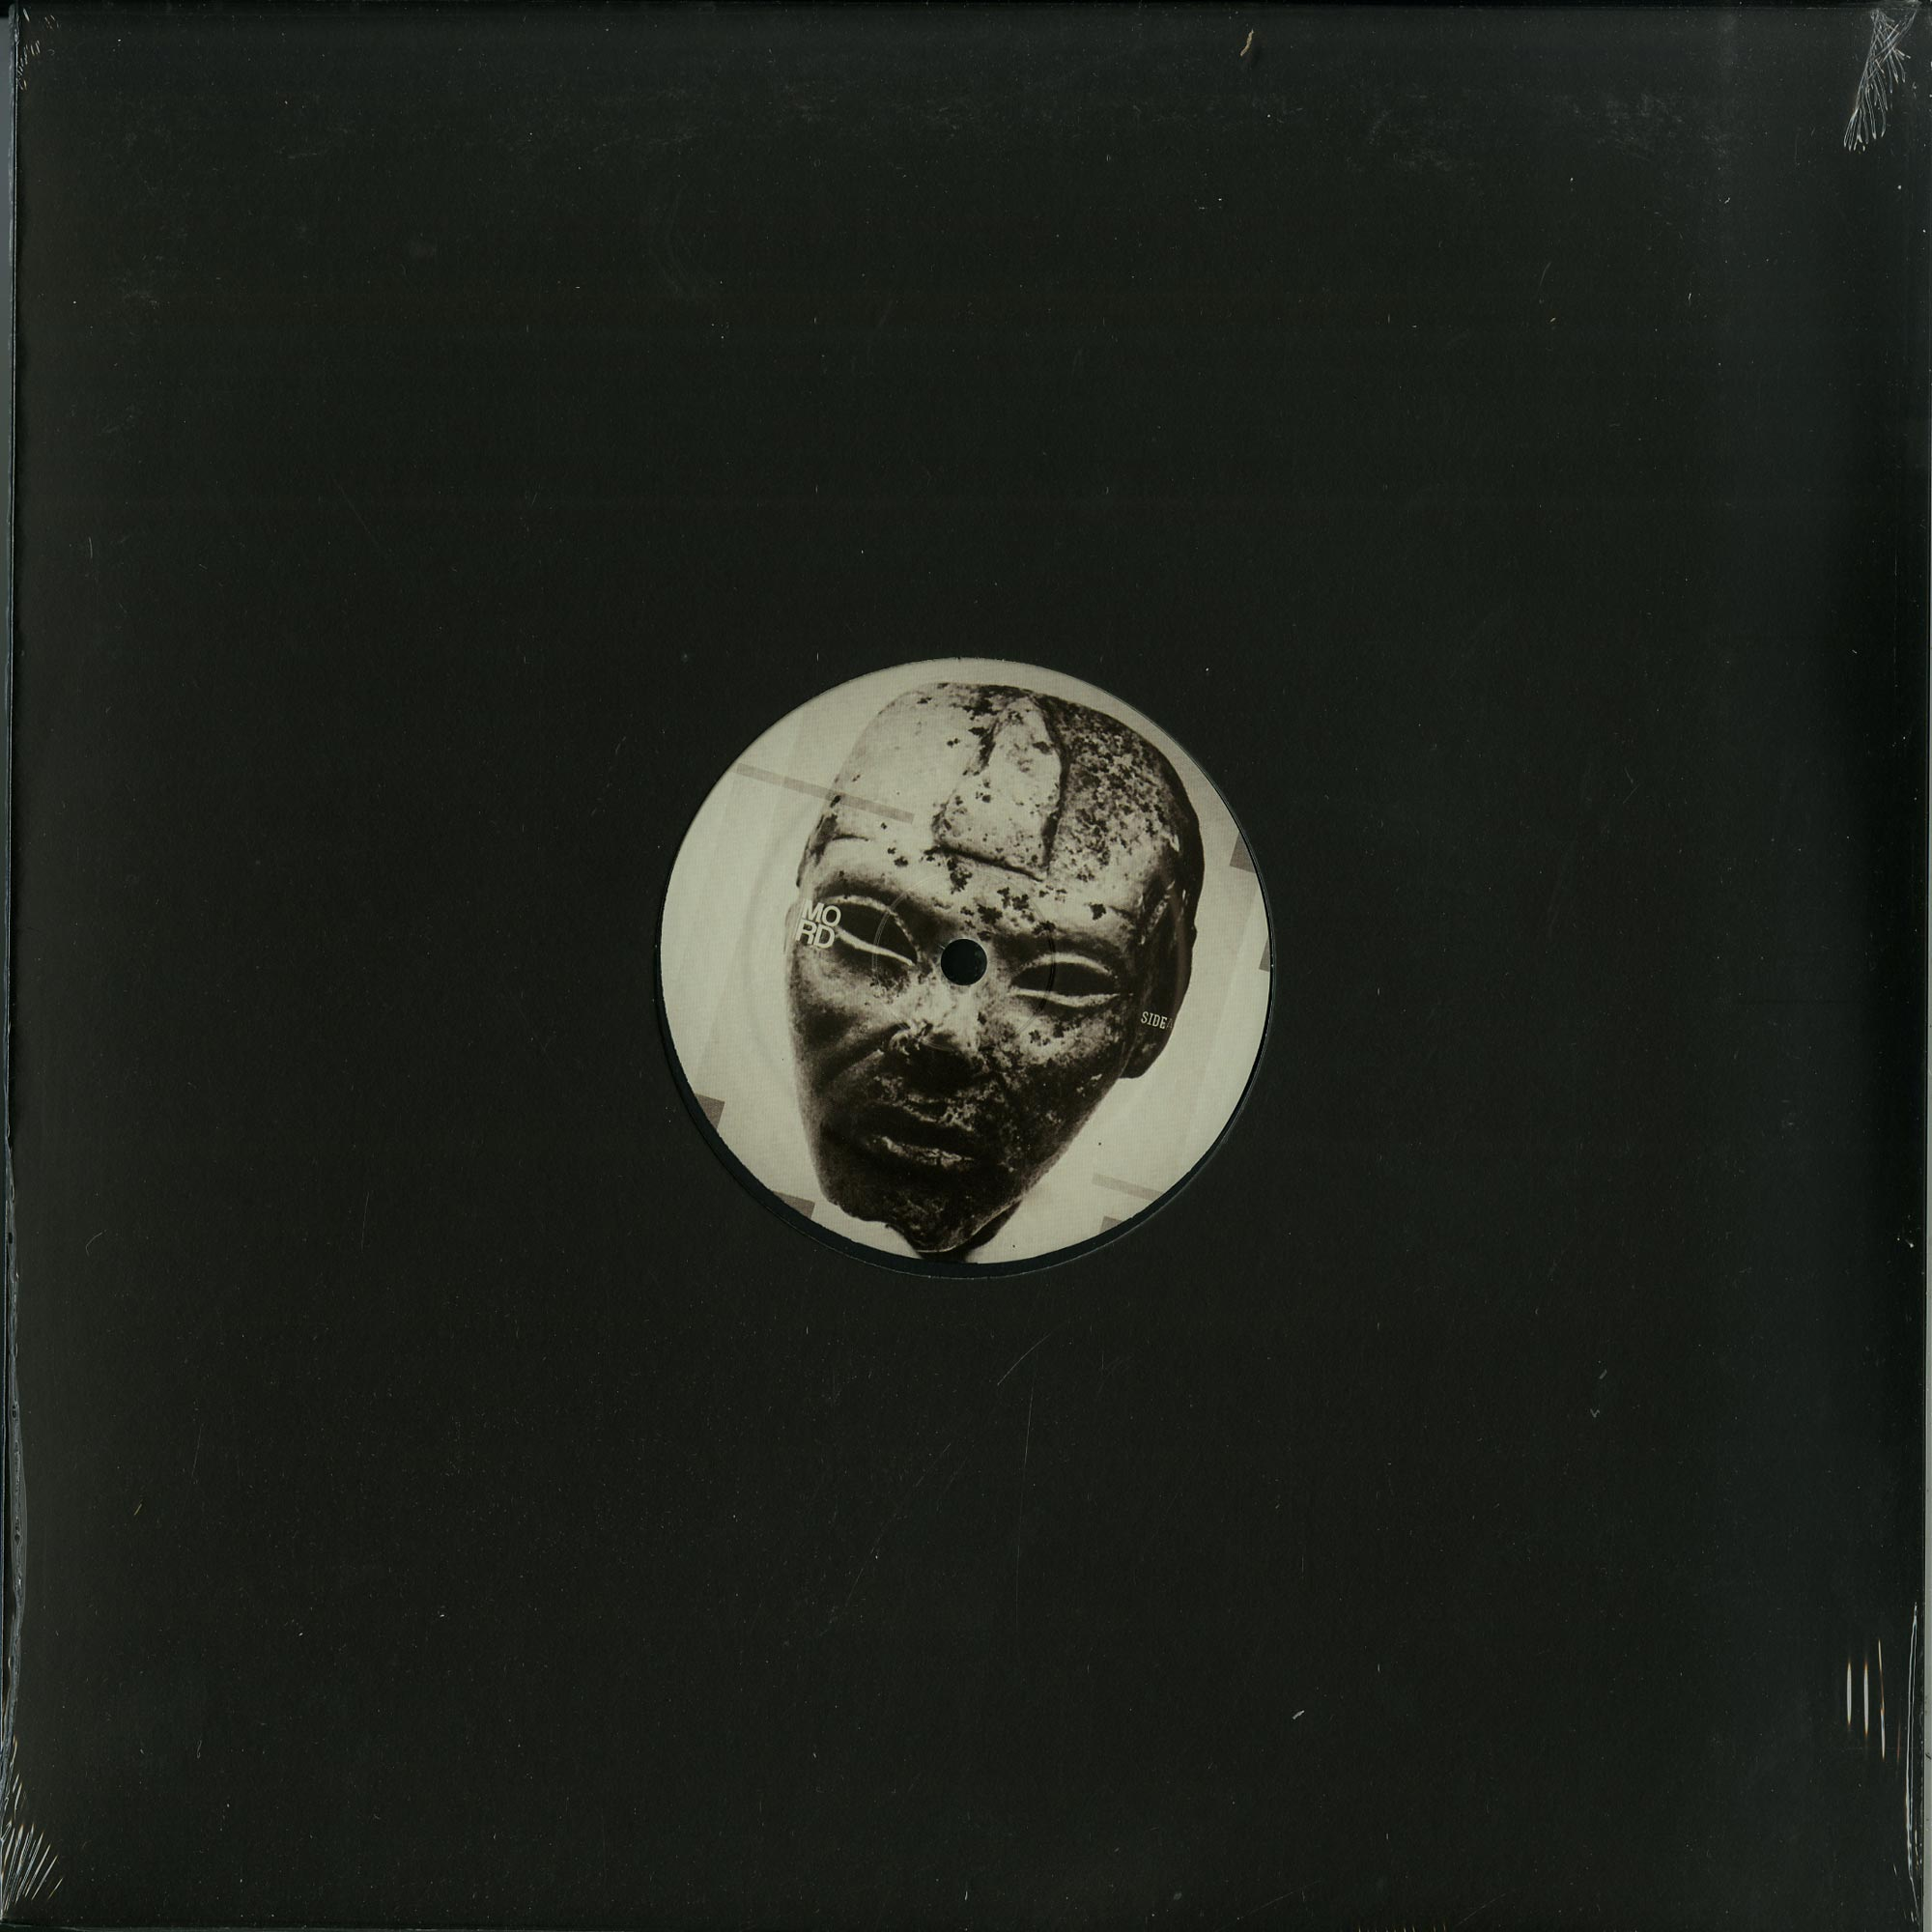 D. Carbone - BLACK BLOCK EP